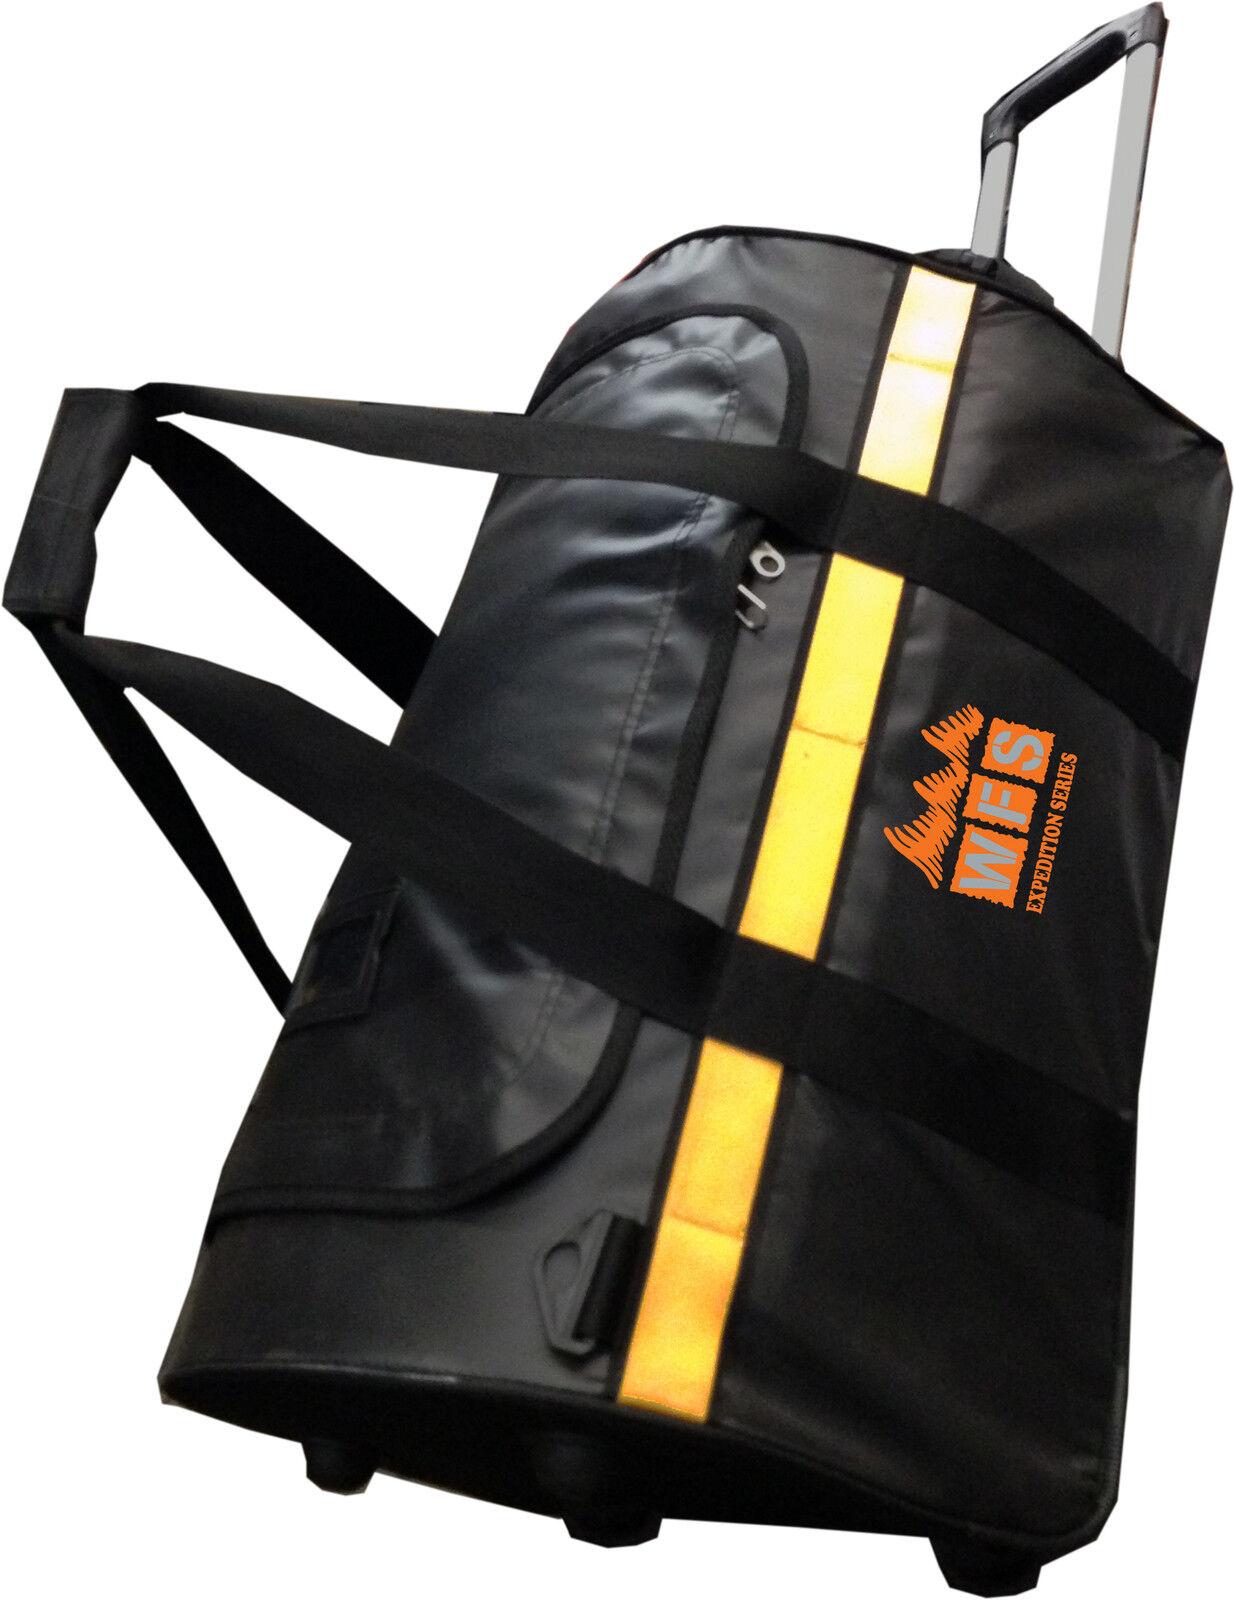 BRAND NEW  WFS 24  TARPAULIN WHEELIE DUFFEL BAG